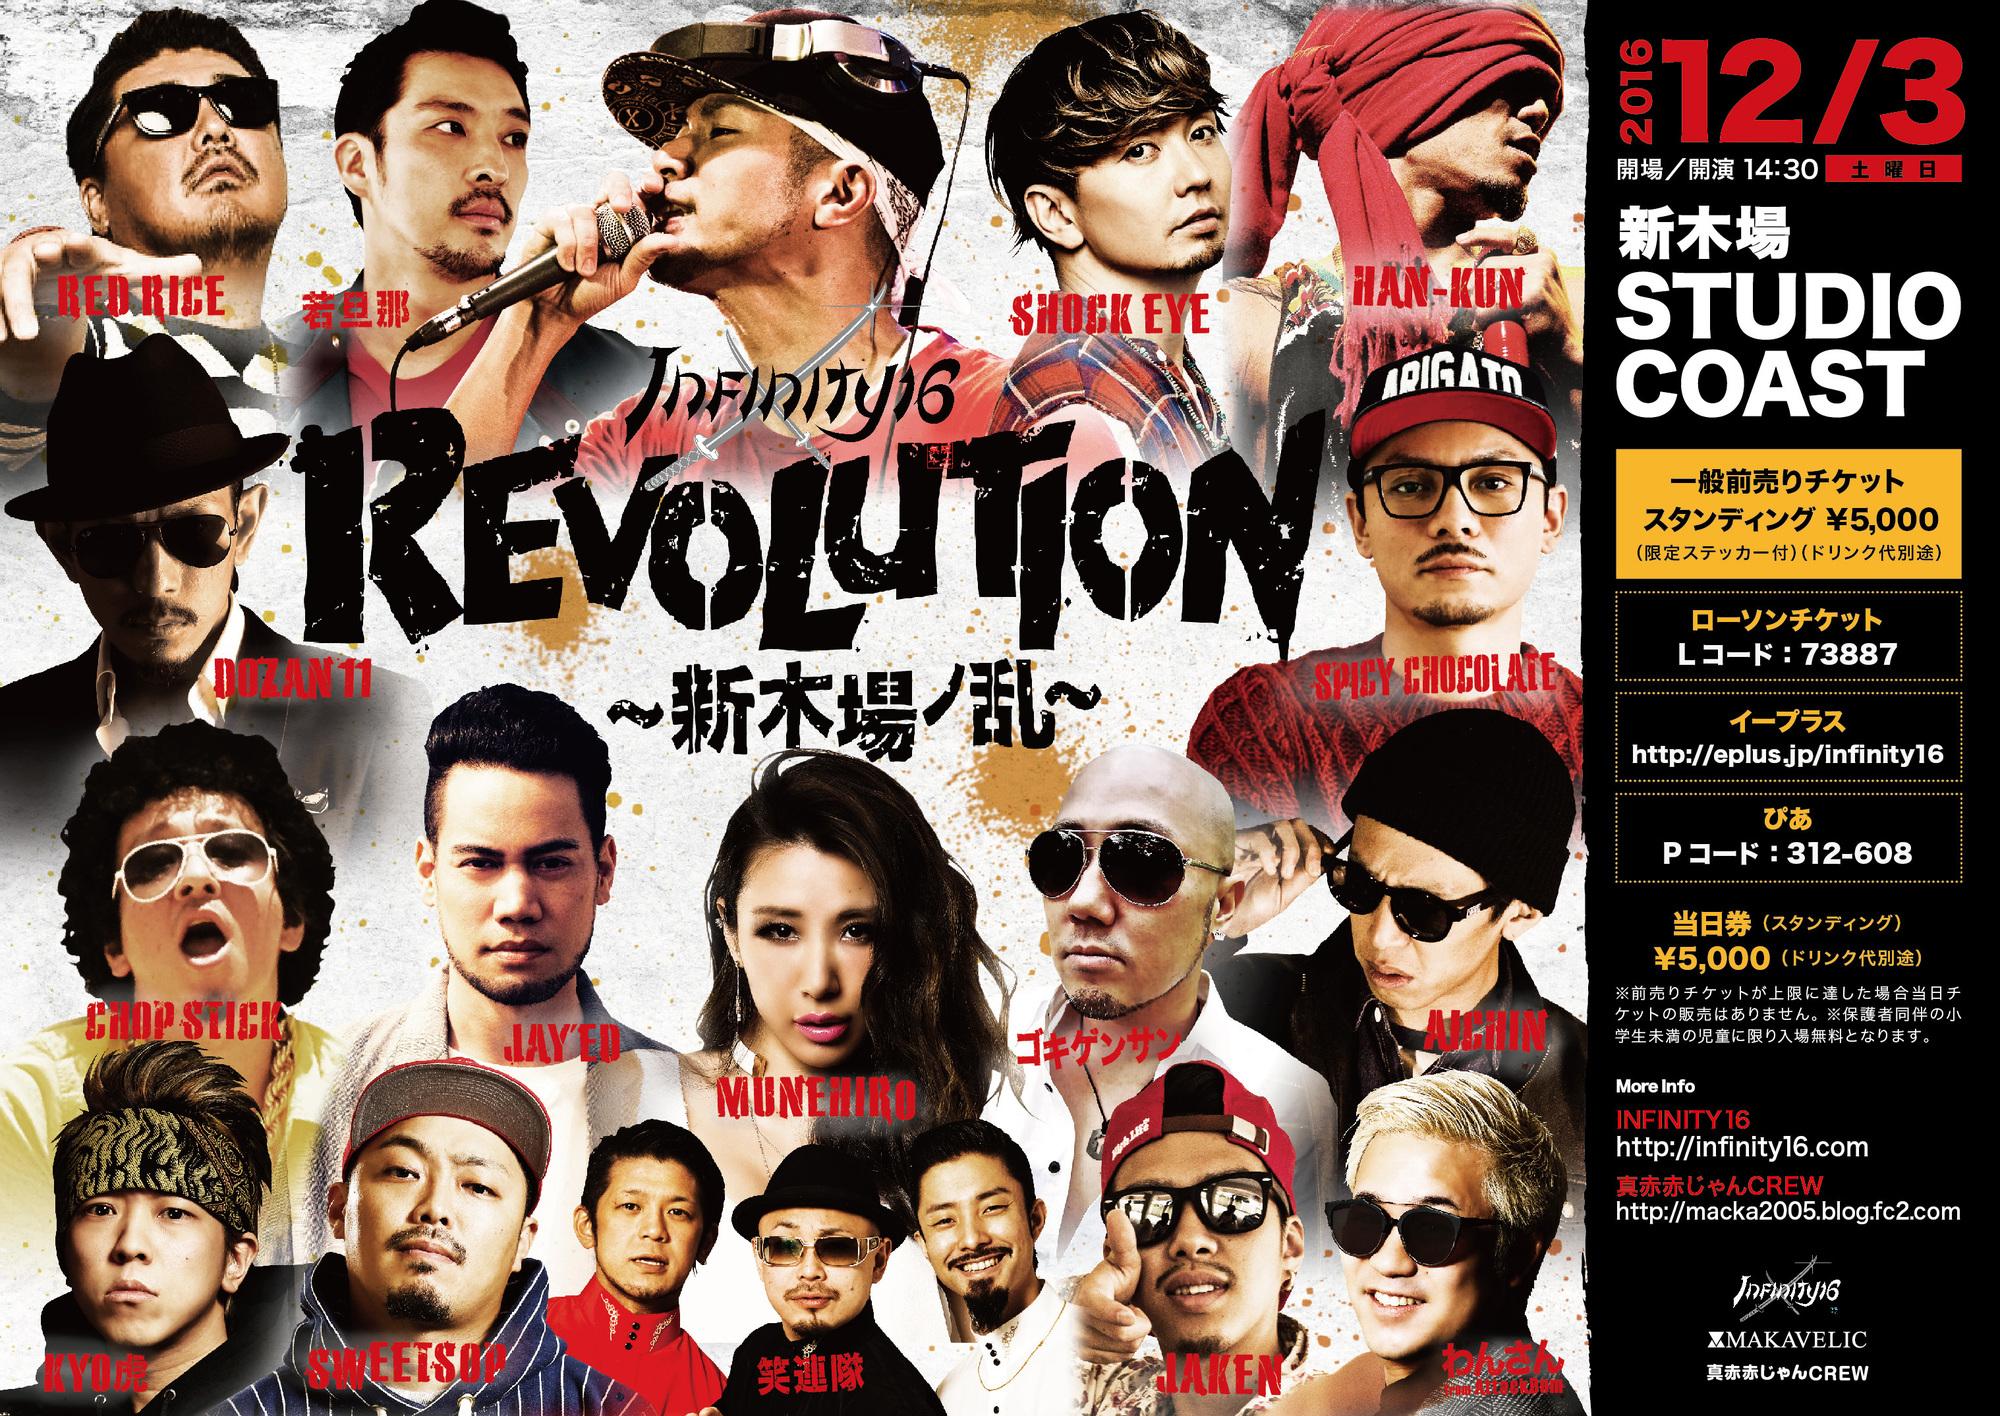 12/3(sat) INFINITY16 presents 「REVOLUTION 」 ~新木場ノ乱 ...